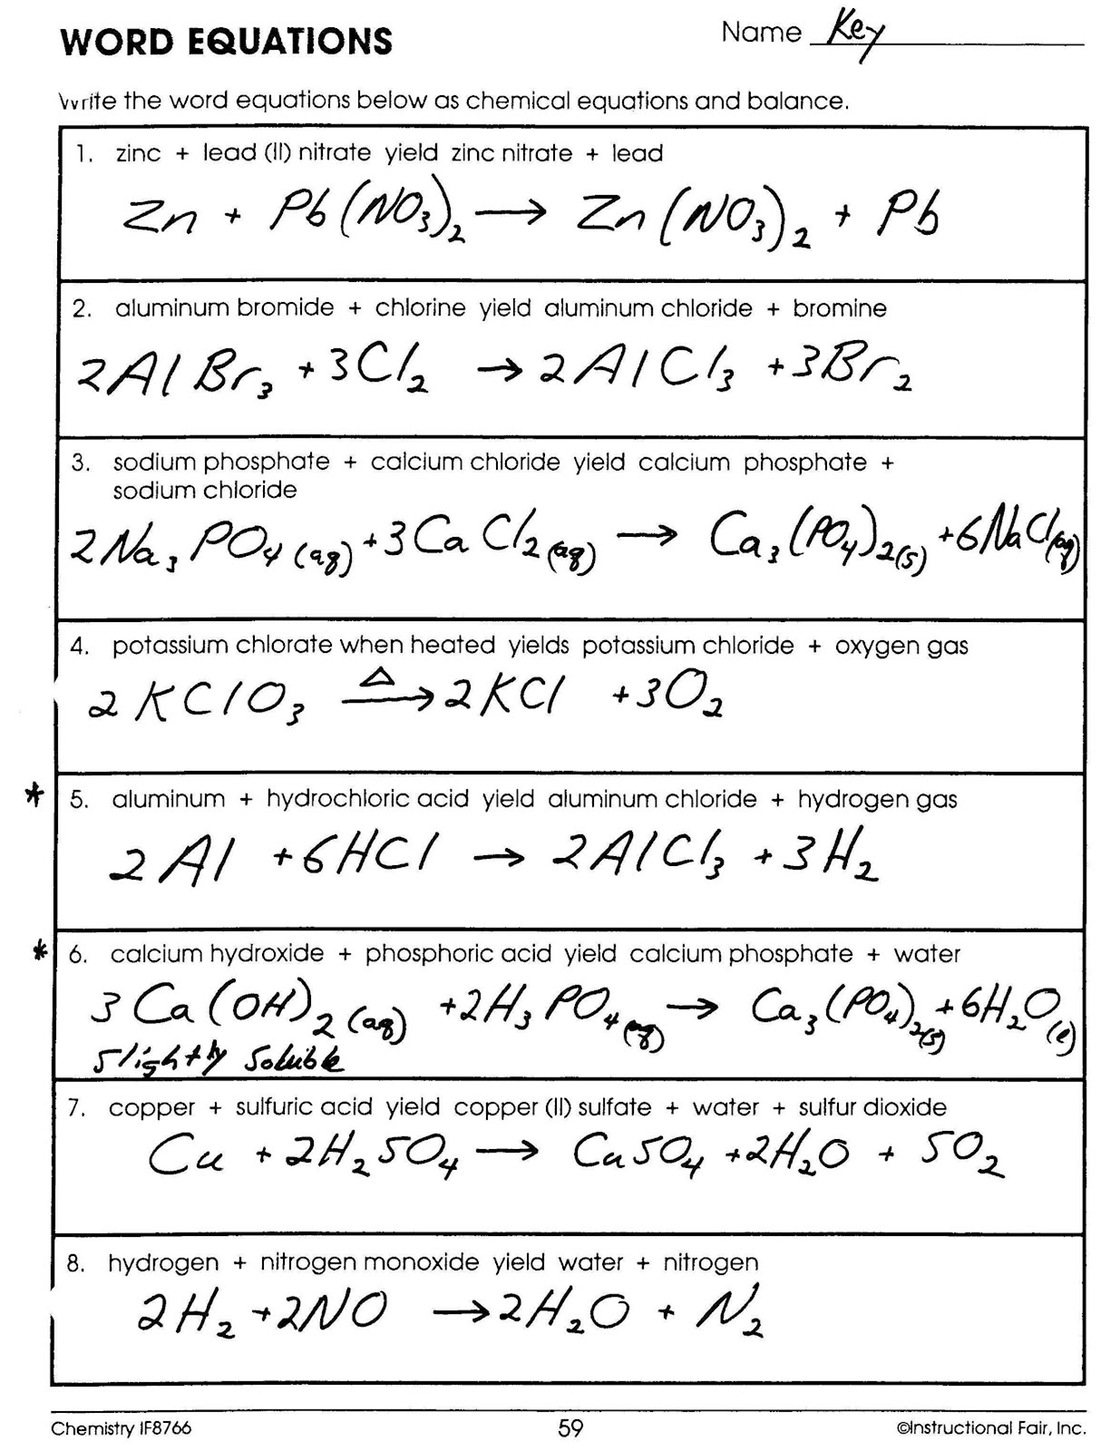 Chemical Word Equations Worksheet Imperialdesignstudio Chemistry